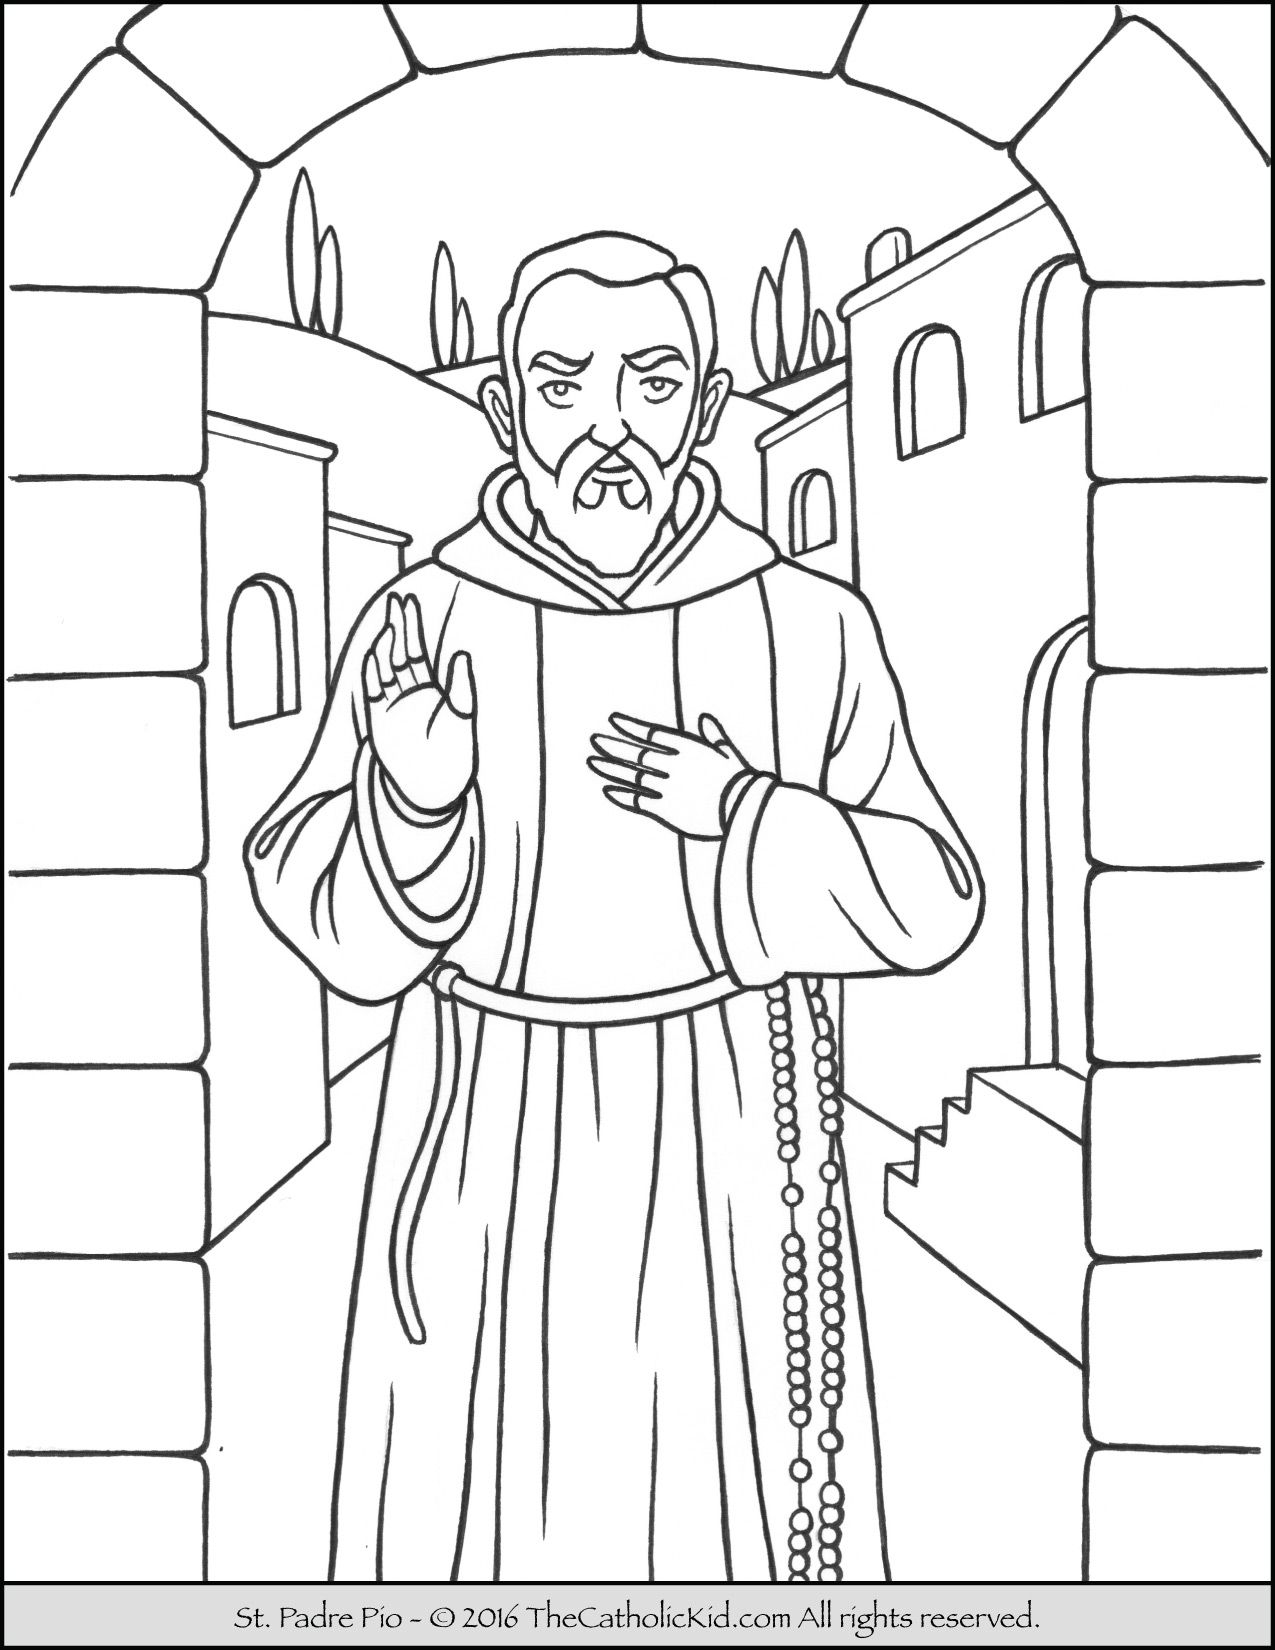 Saint Padre Pio Coloring Page